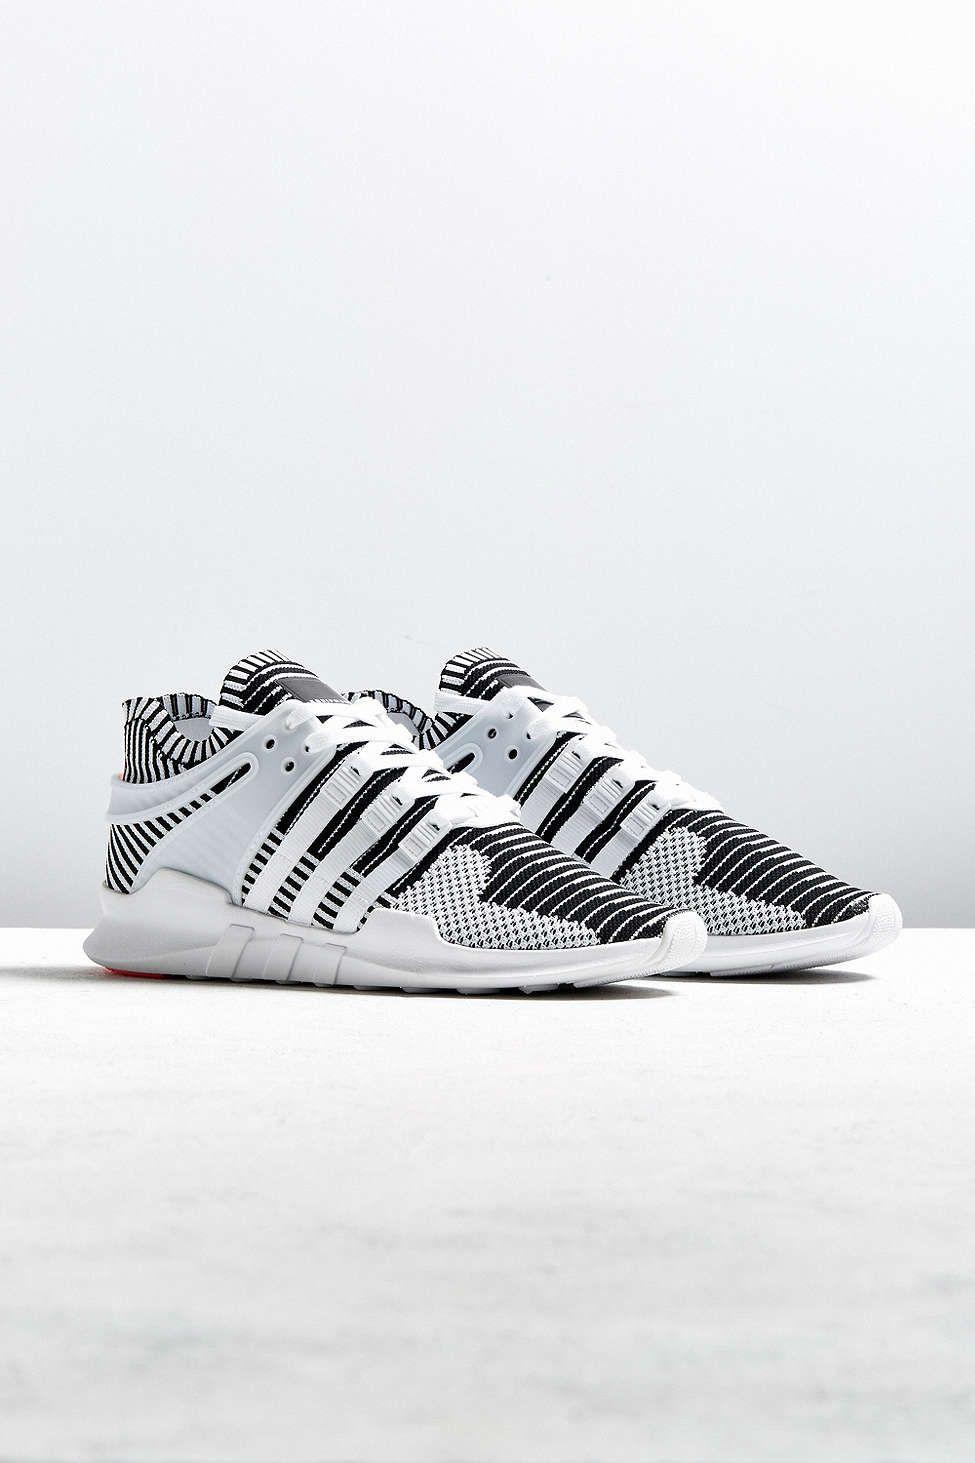 new product 6f487 83bec adidas EQT Support ADV Primeknit Sneaker